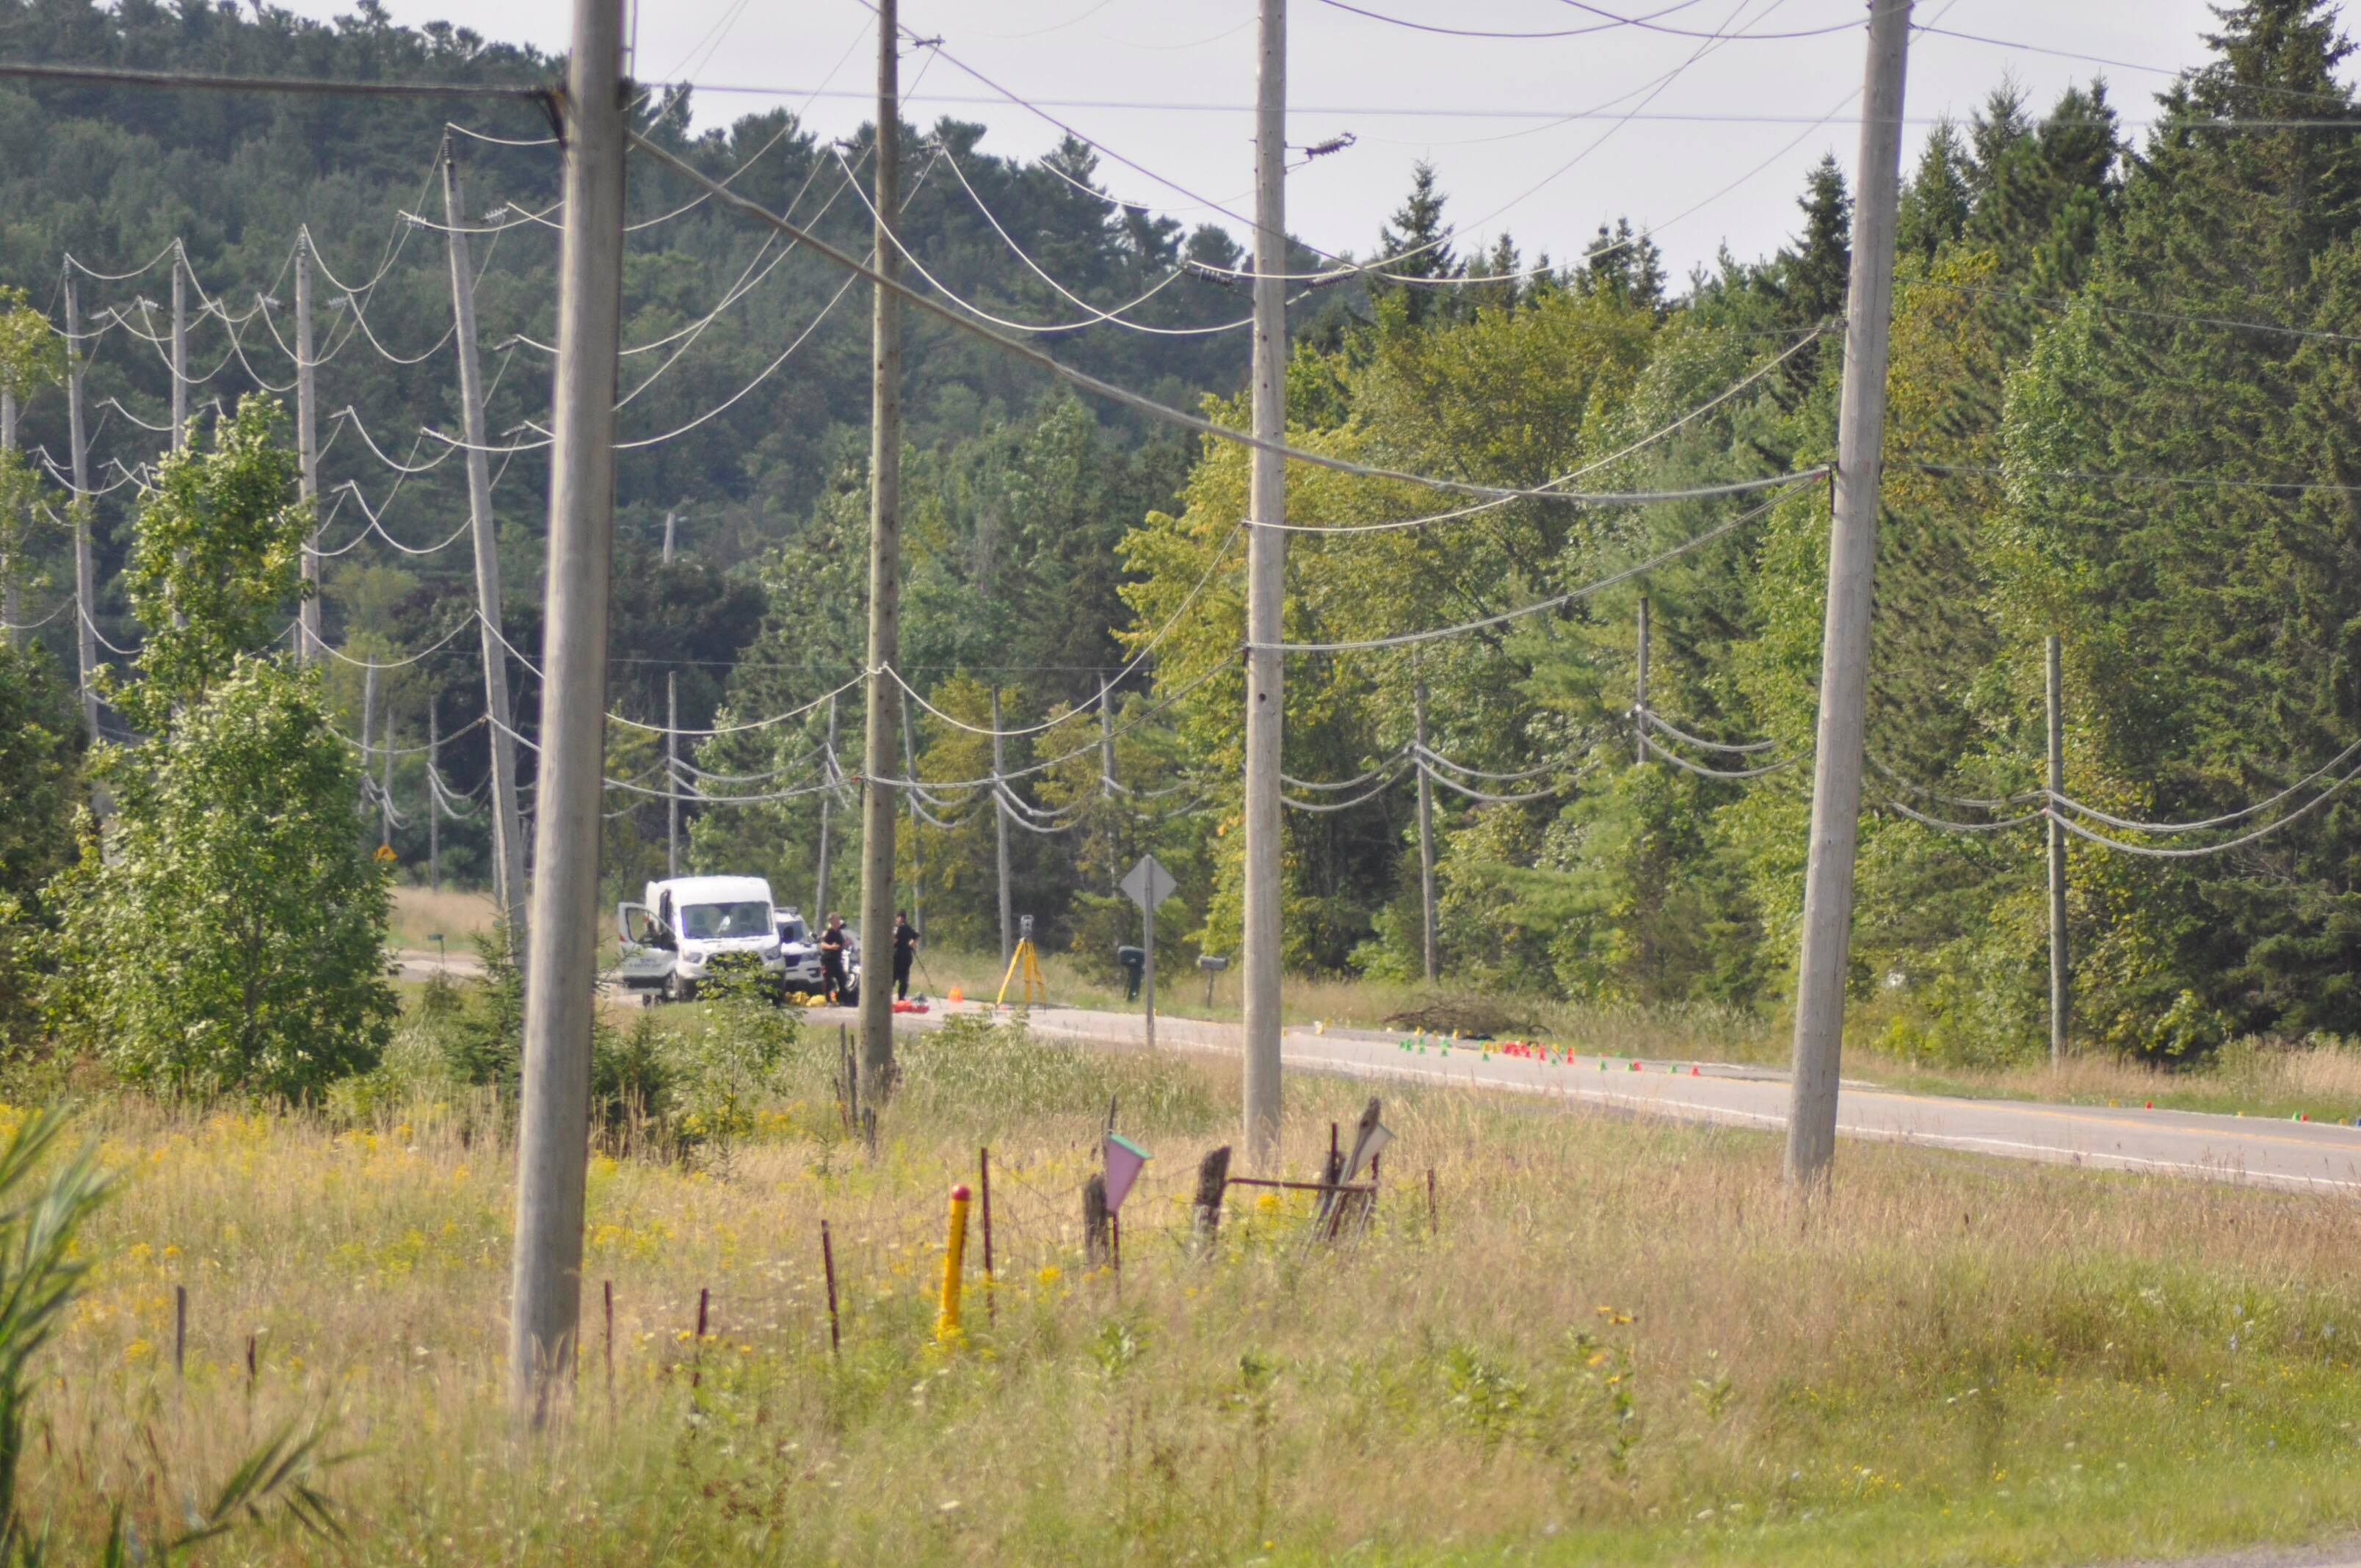 Kingston Police seek next of kin following fatal accident on